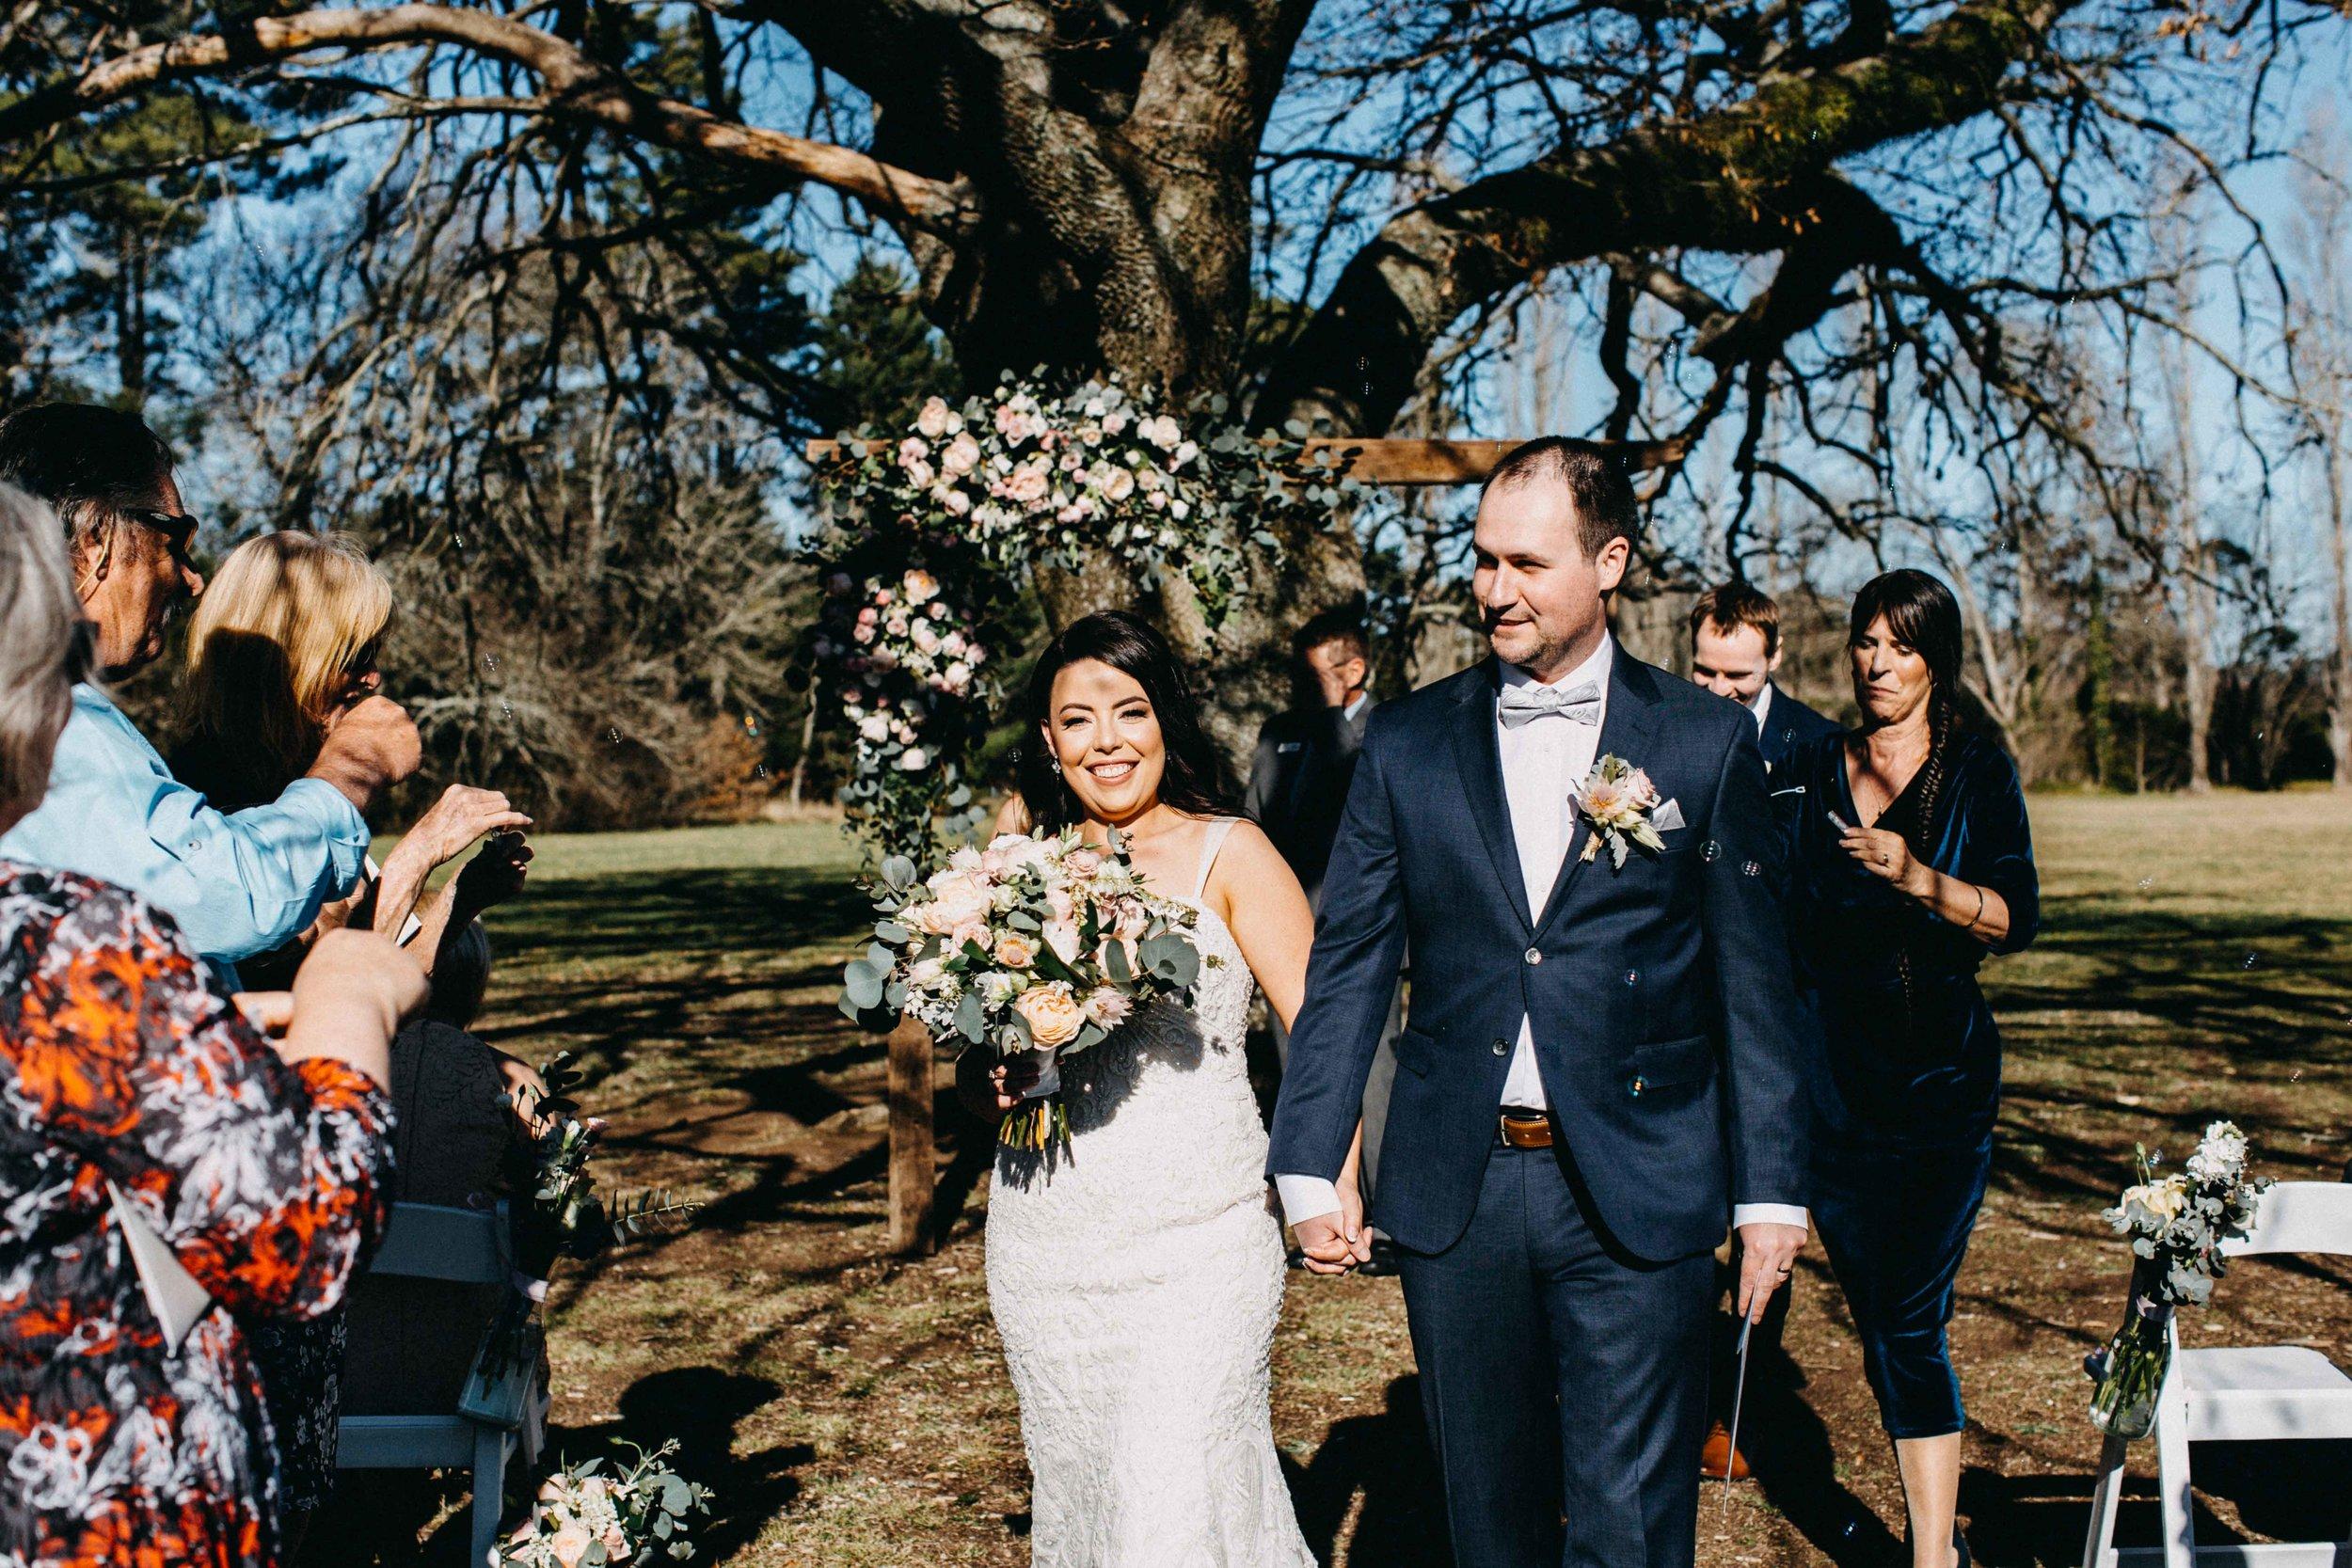 exeter-southern-highlands-wedding-www.emilyobrienphotography.net -69.jpg